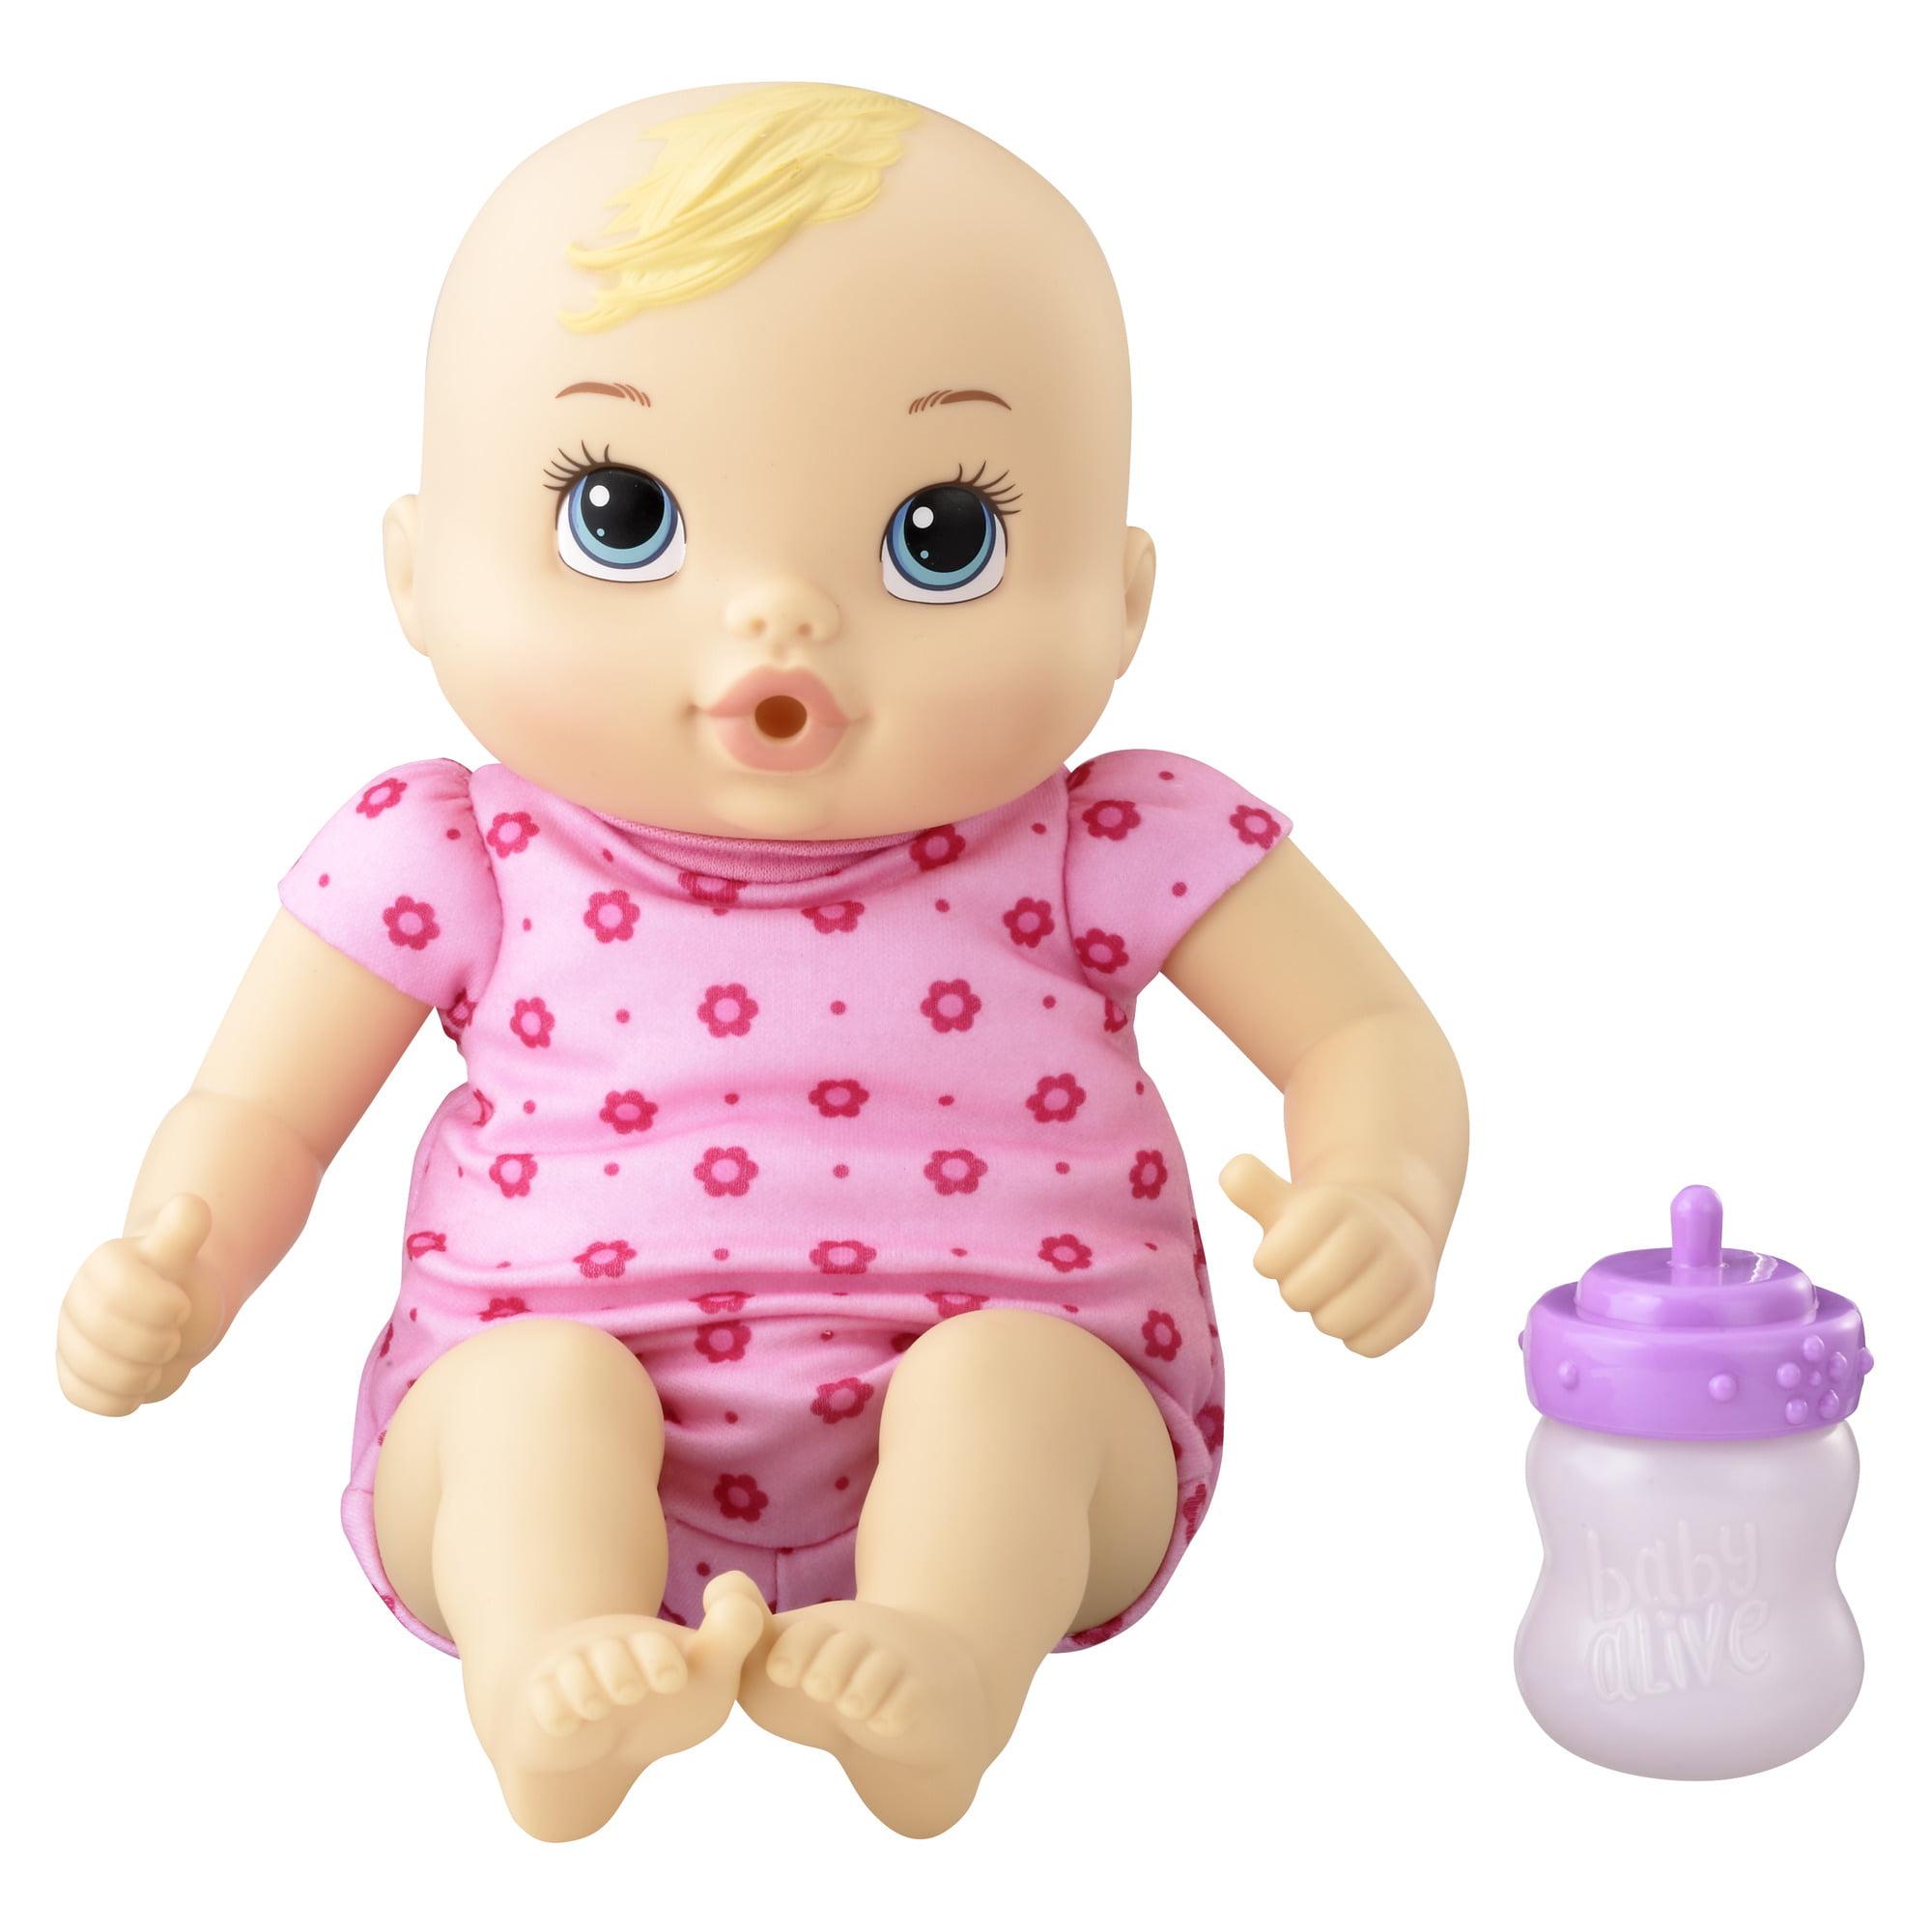 Baby alive luv n snuggle baby (blonde curly hair)